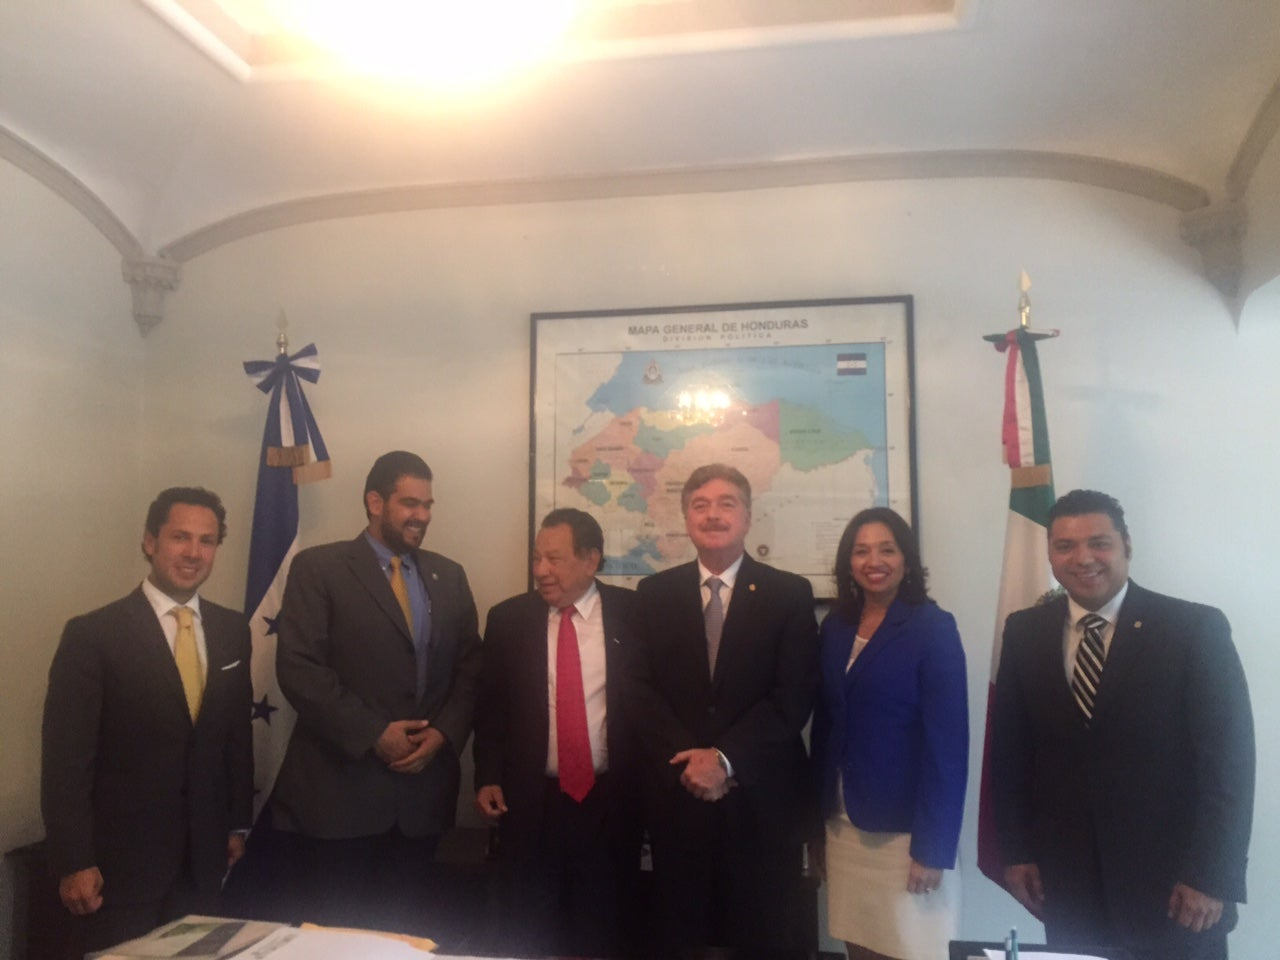 Honduras abrirá nuevo consulado en Tijuana, México